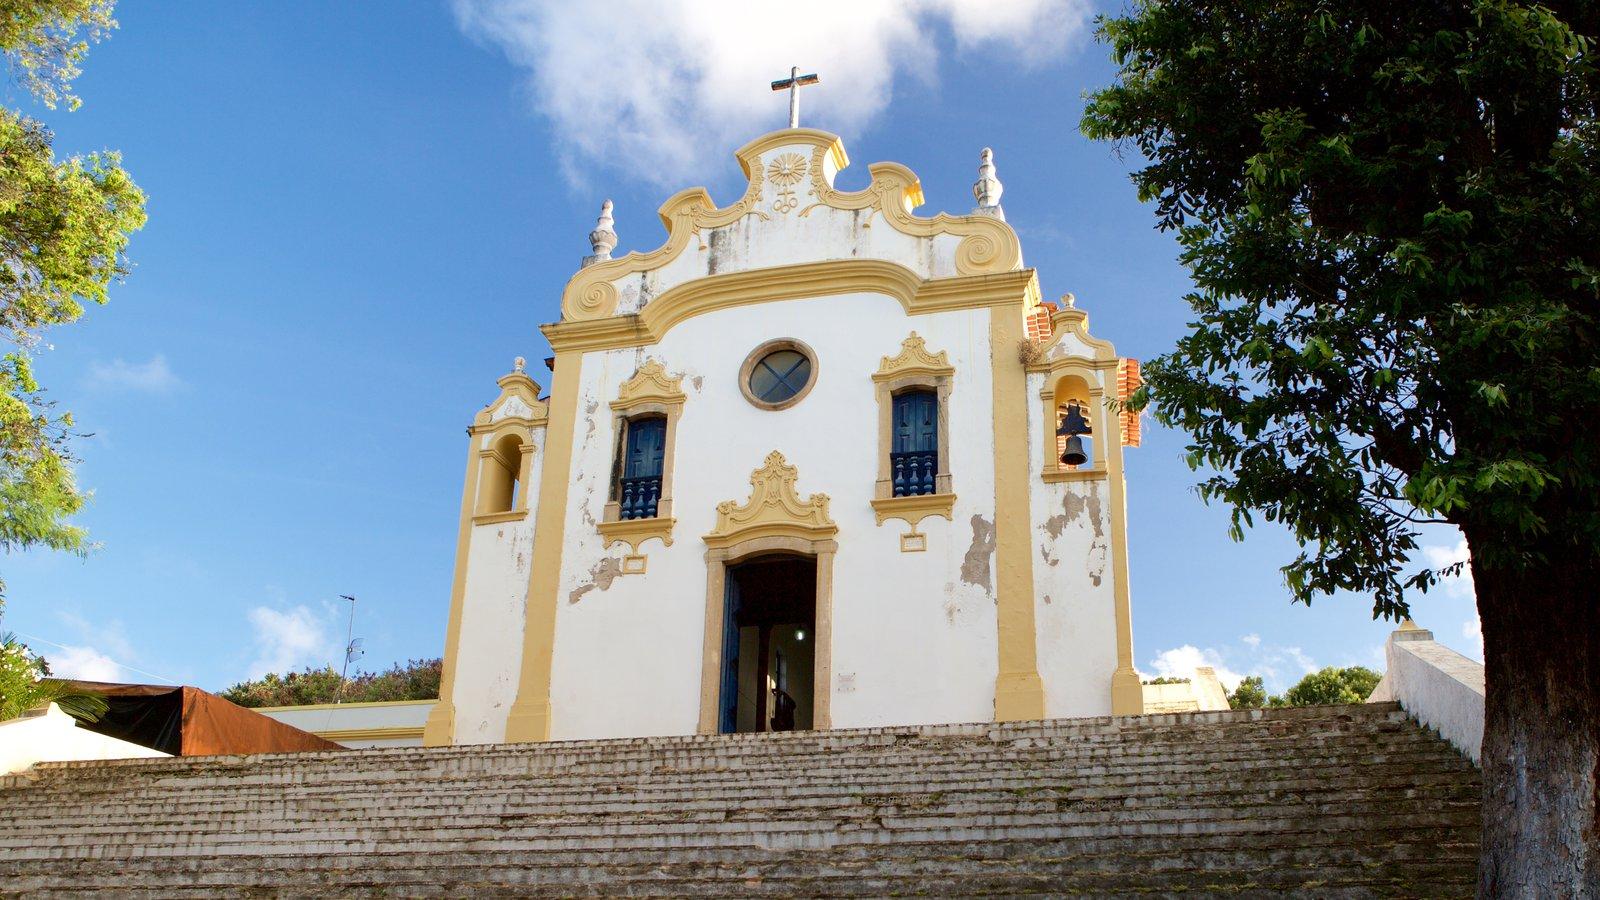 Fernando de Noronha caracterizando aspectos religiosos e uma igreja ou catedral